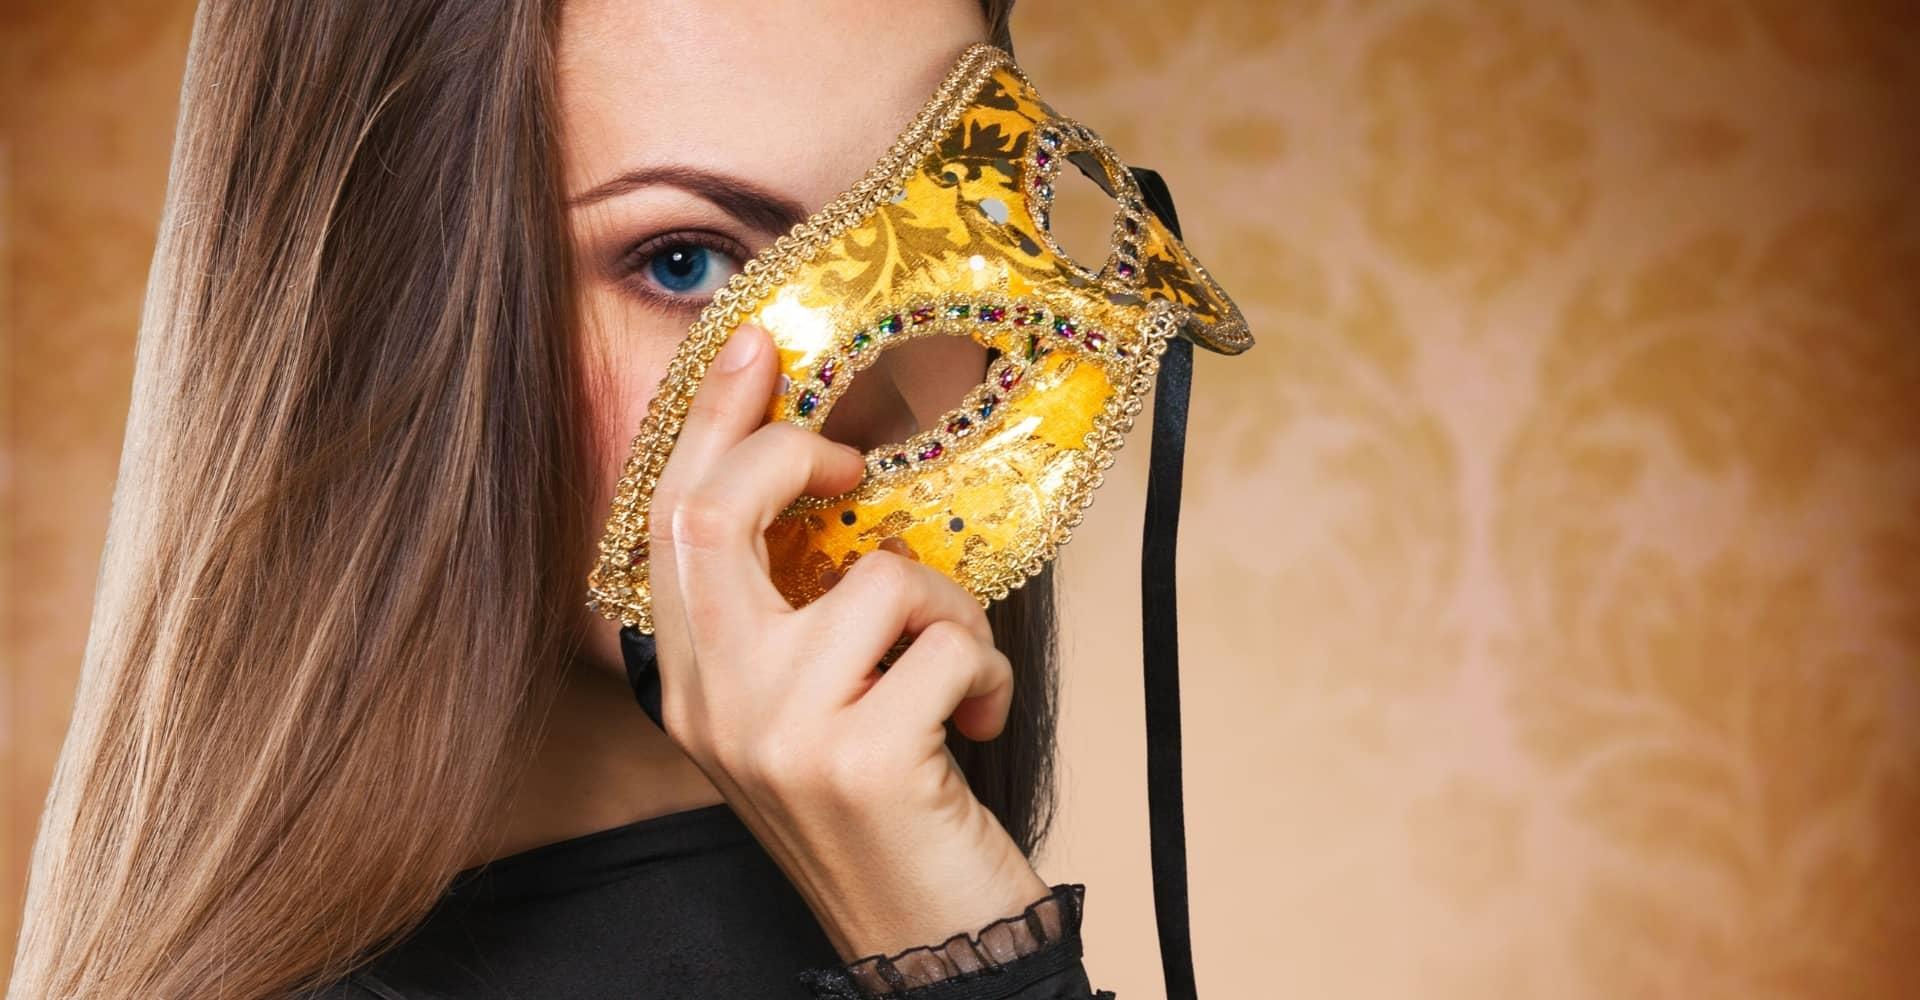 It's Just A Damned Piece of Cloth Mask Terry Neudorf Kimberly Neudorf